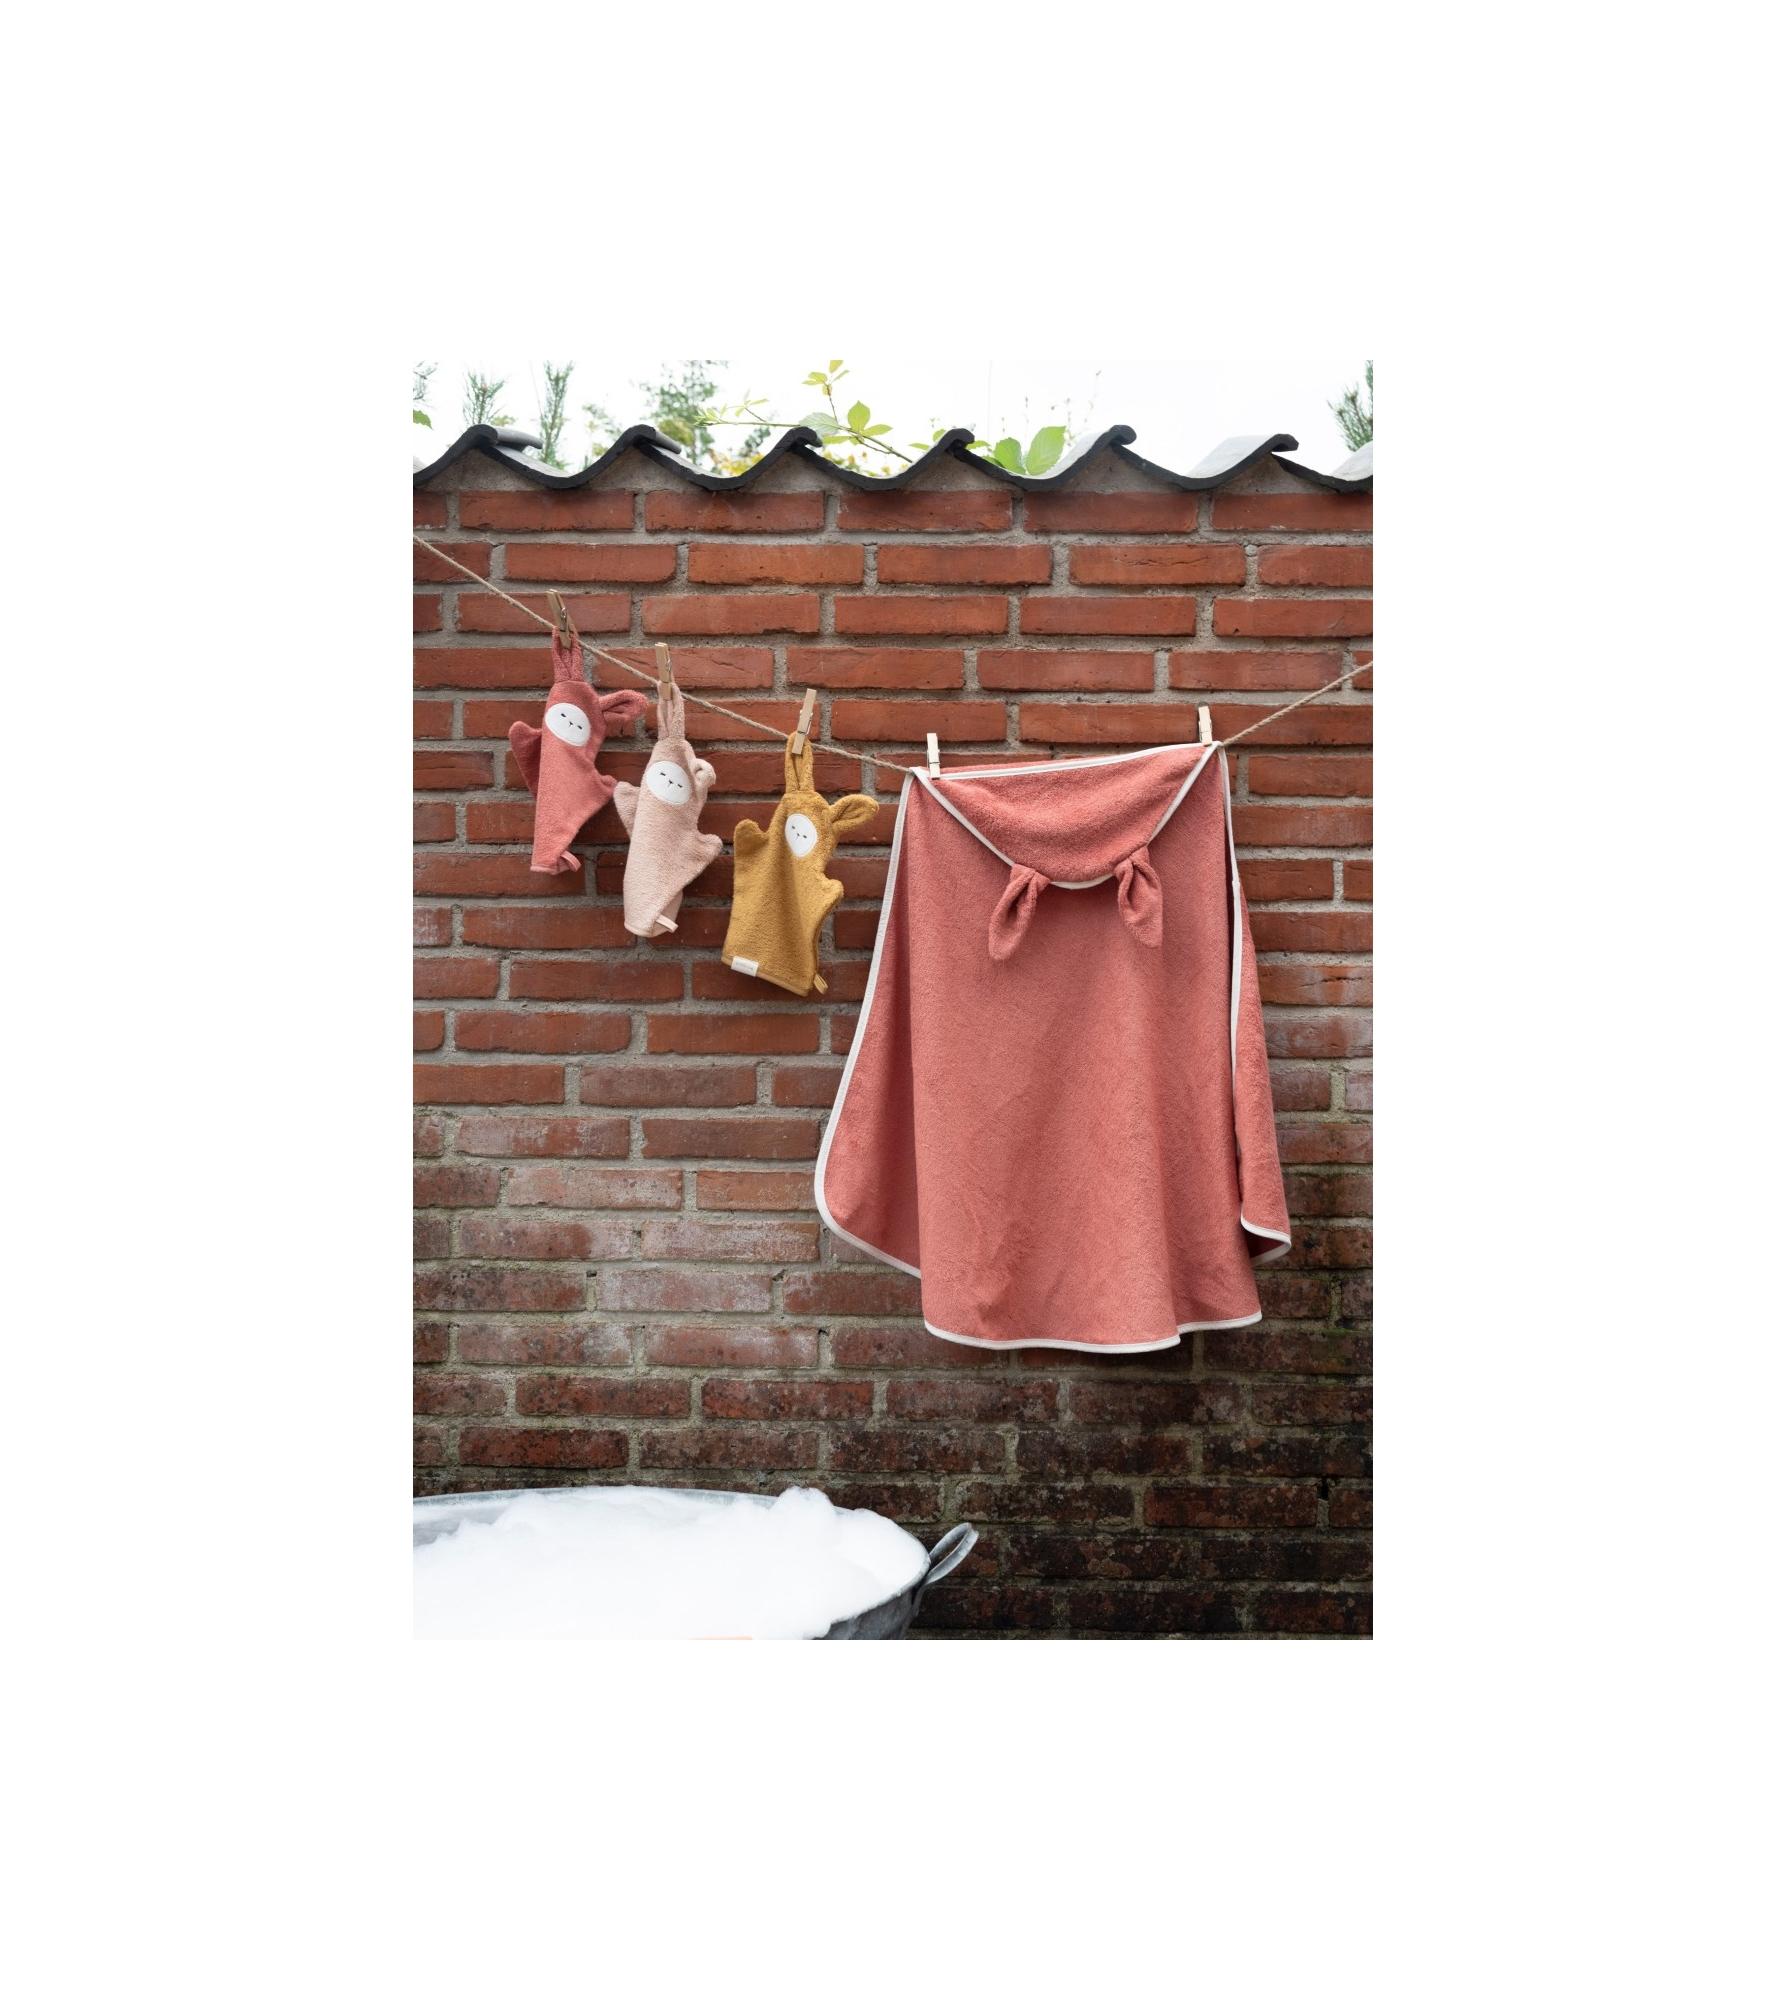 Hooded Baby Towel - Bunny - Clay 3_edit.jpg